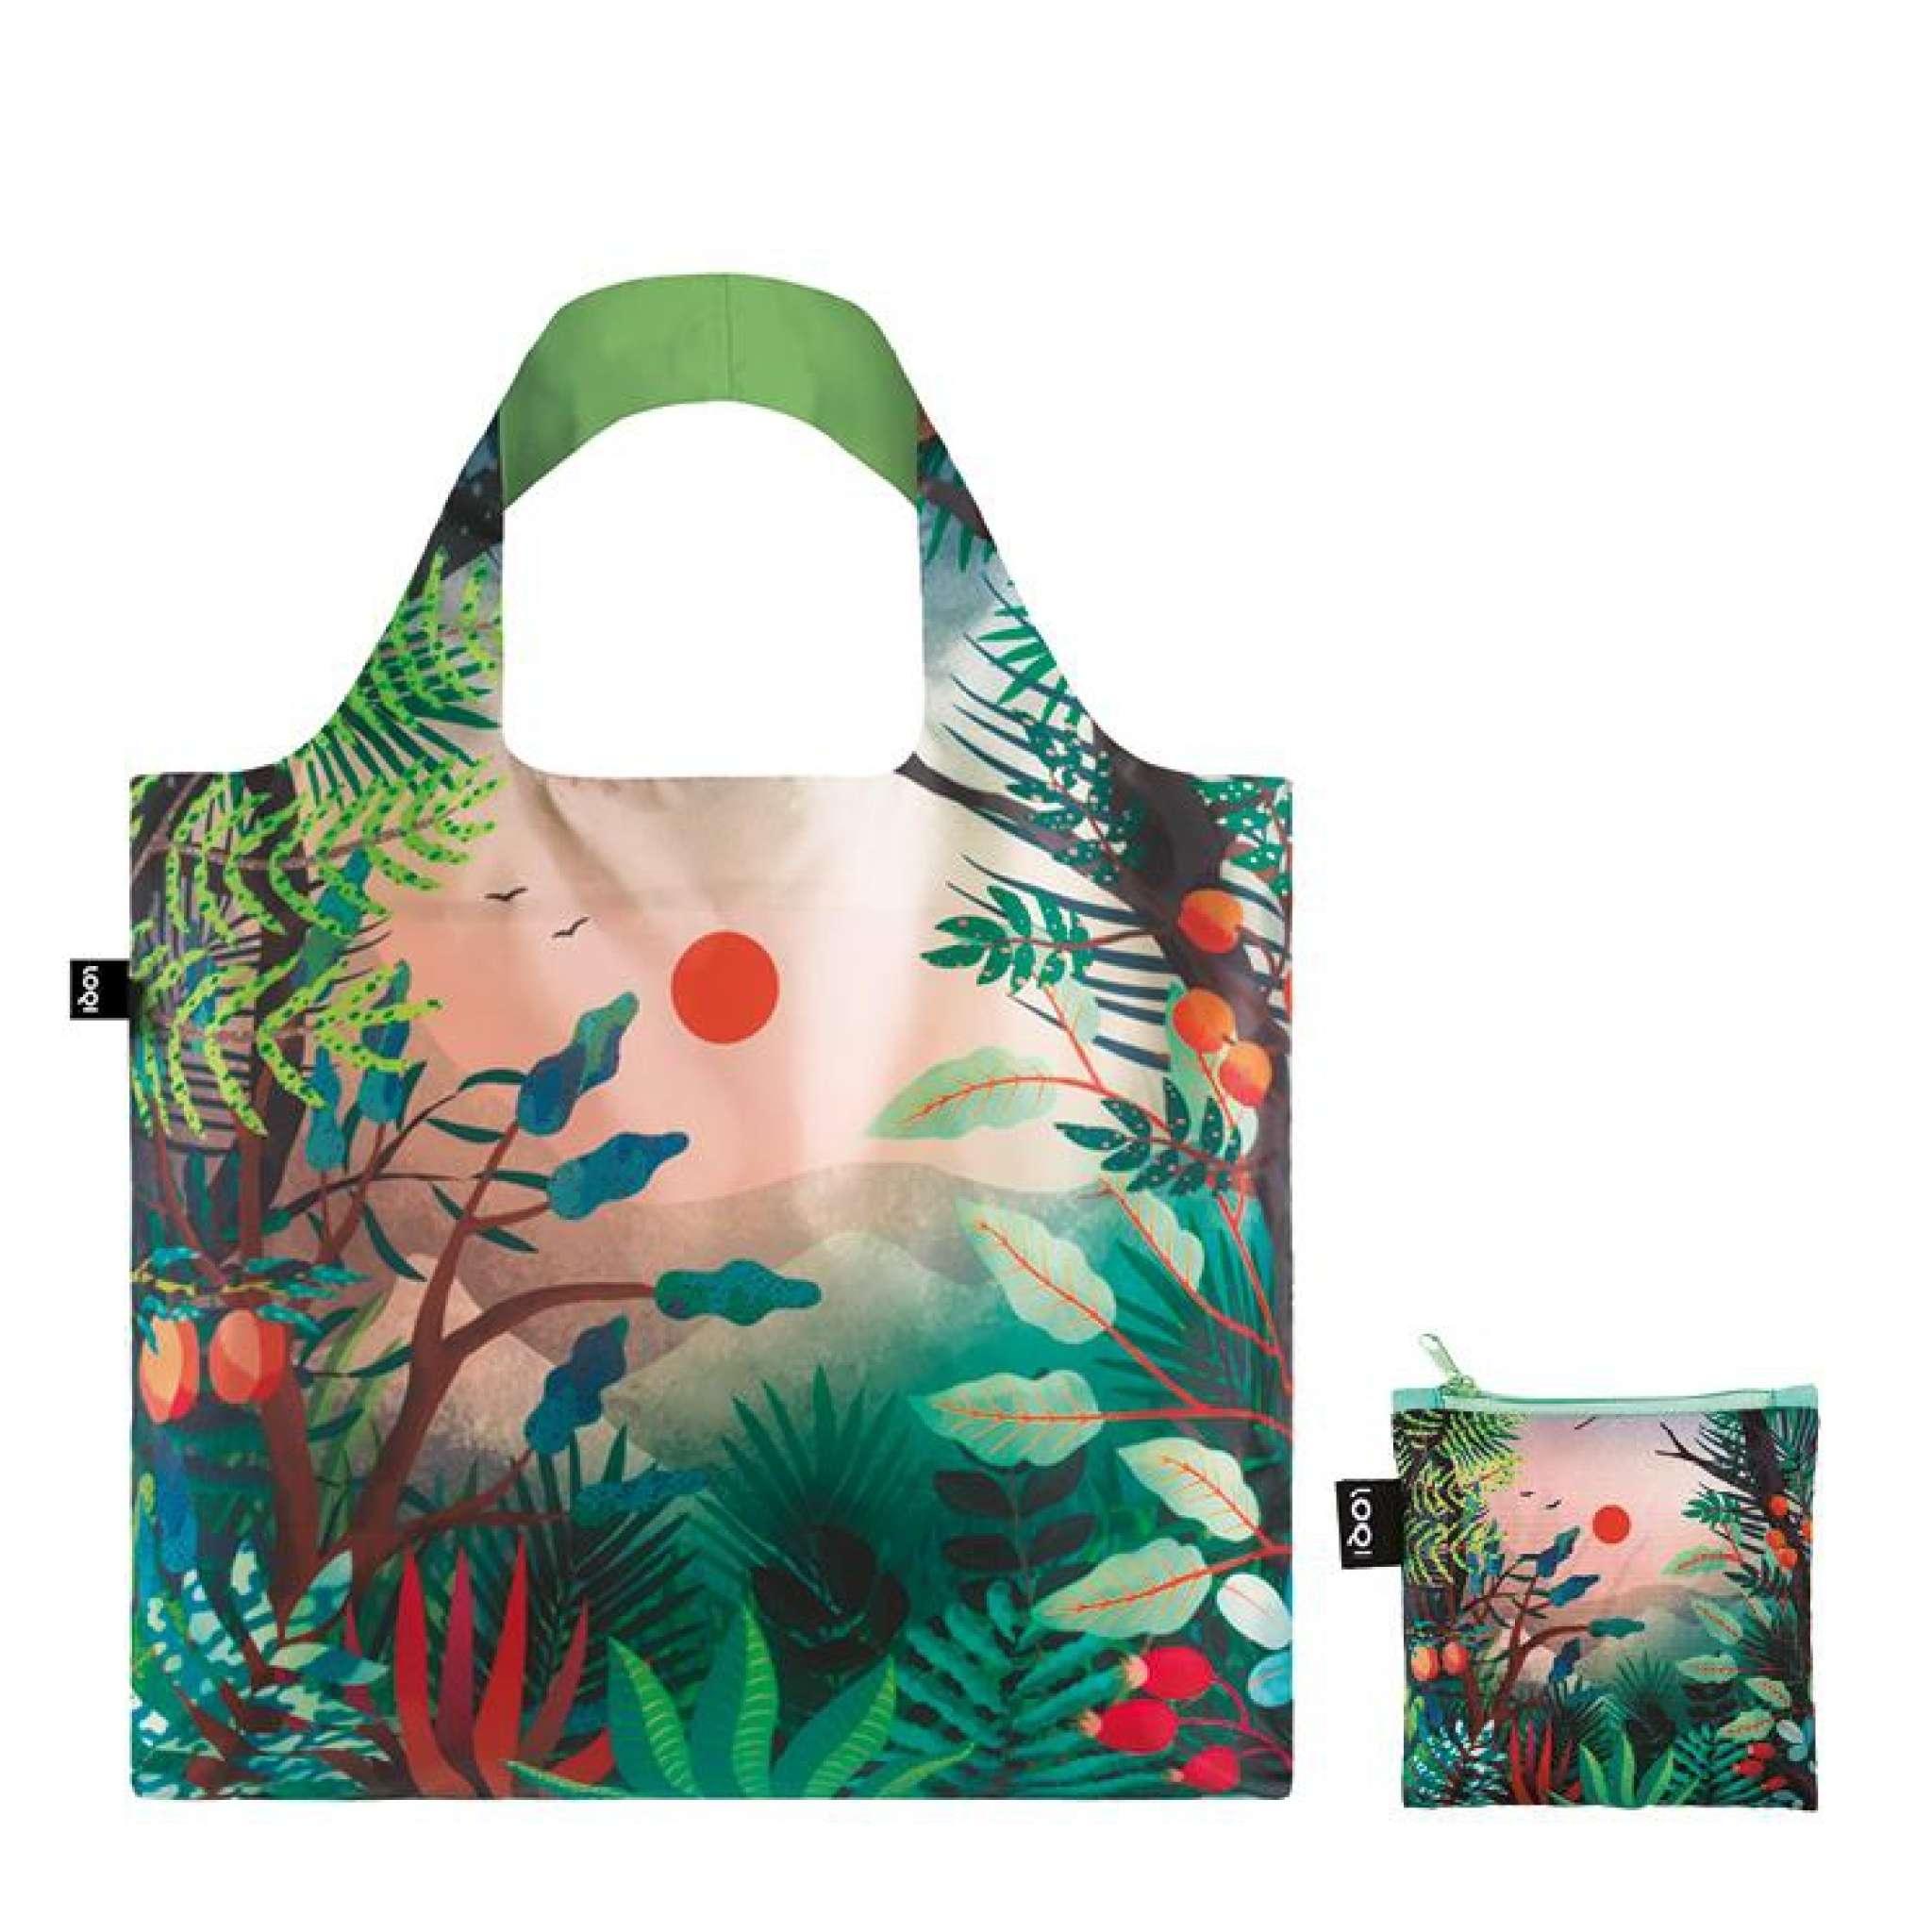 Shoppingbag, HVASS&HANNIBAL Arbaro